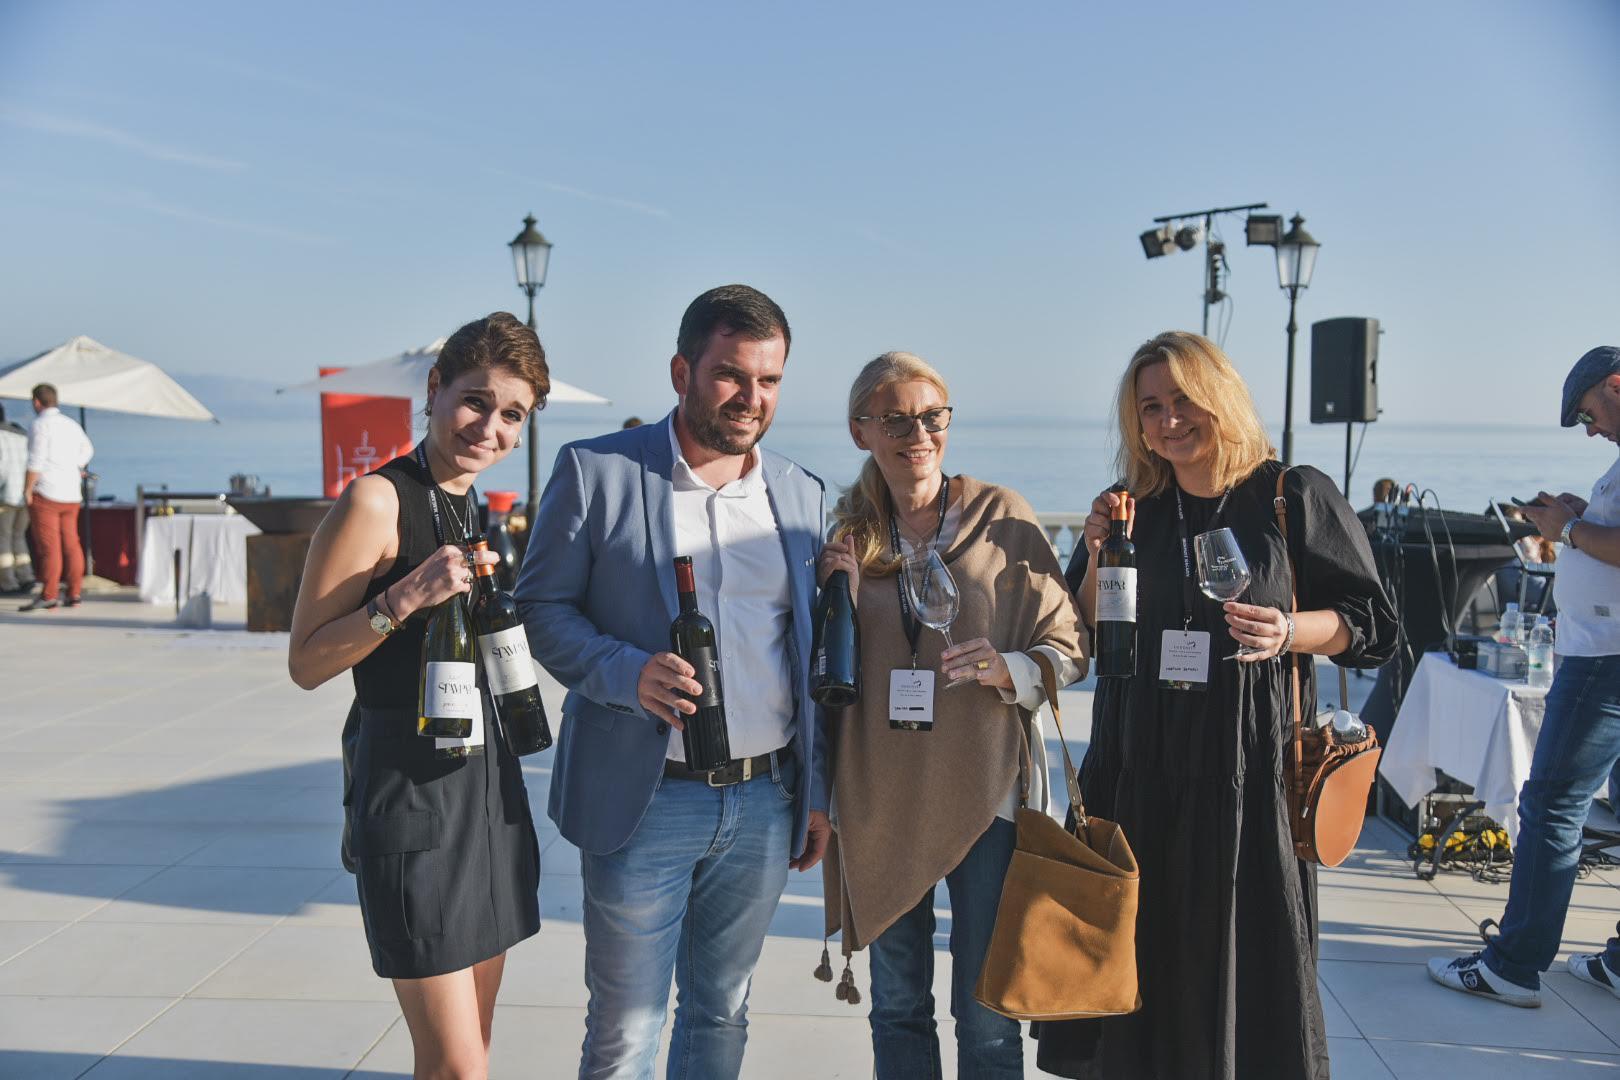 Uskoro nas očekuje dvodnevni Wine Garden by Hedonist u Opatiji!